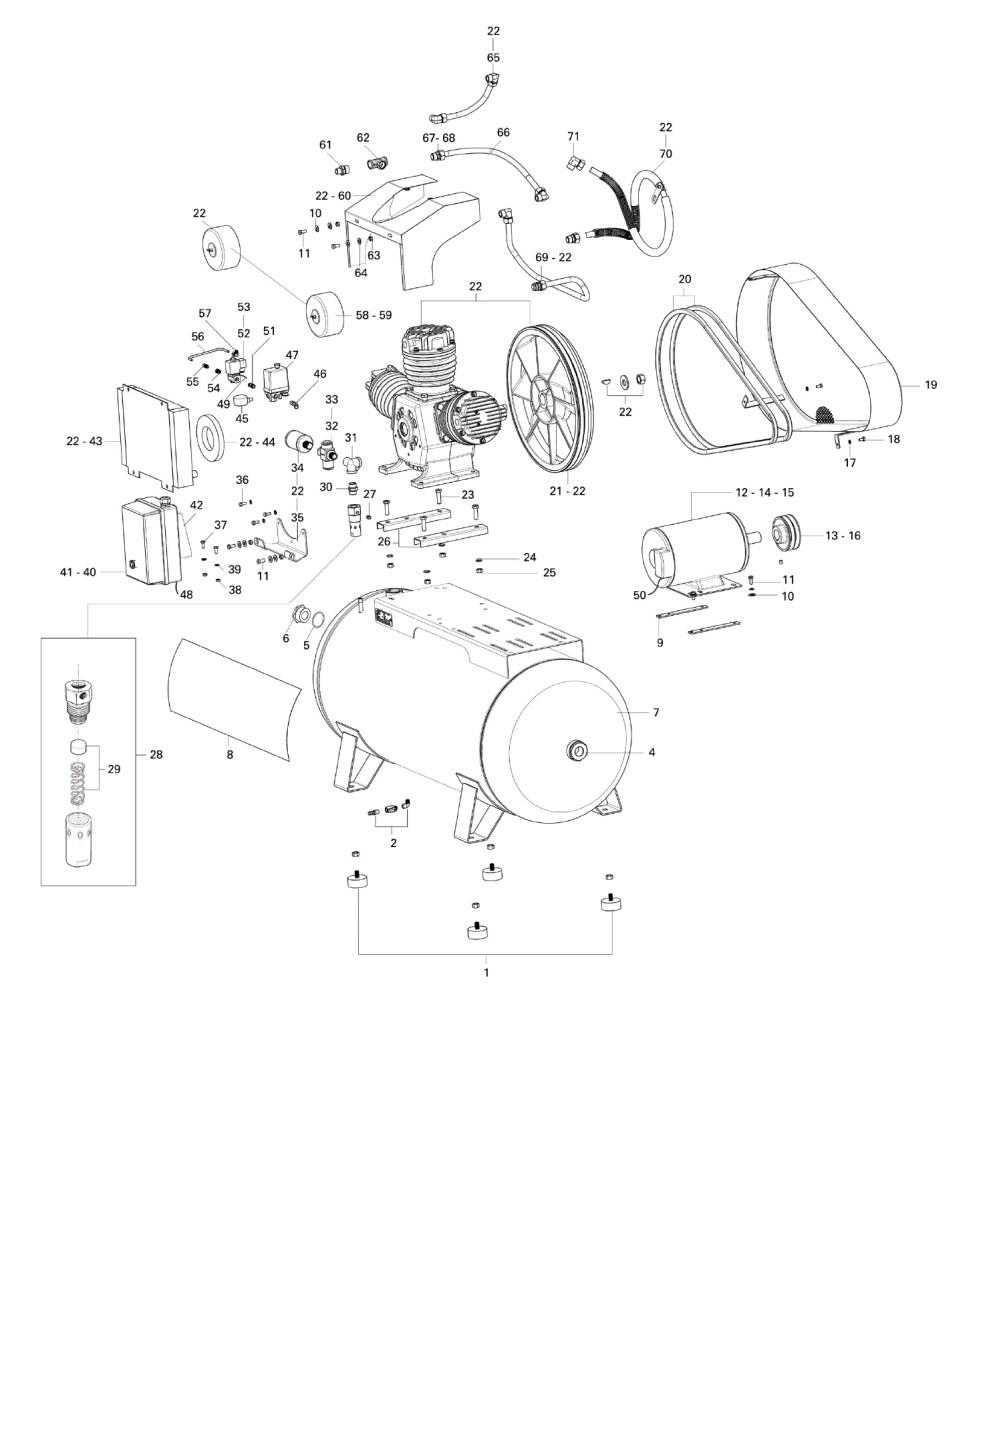 medium resolution of schulz oilless air compressor csw 60 420 15 hp 60 cfm